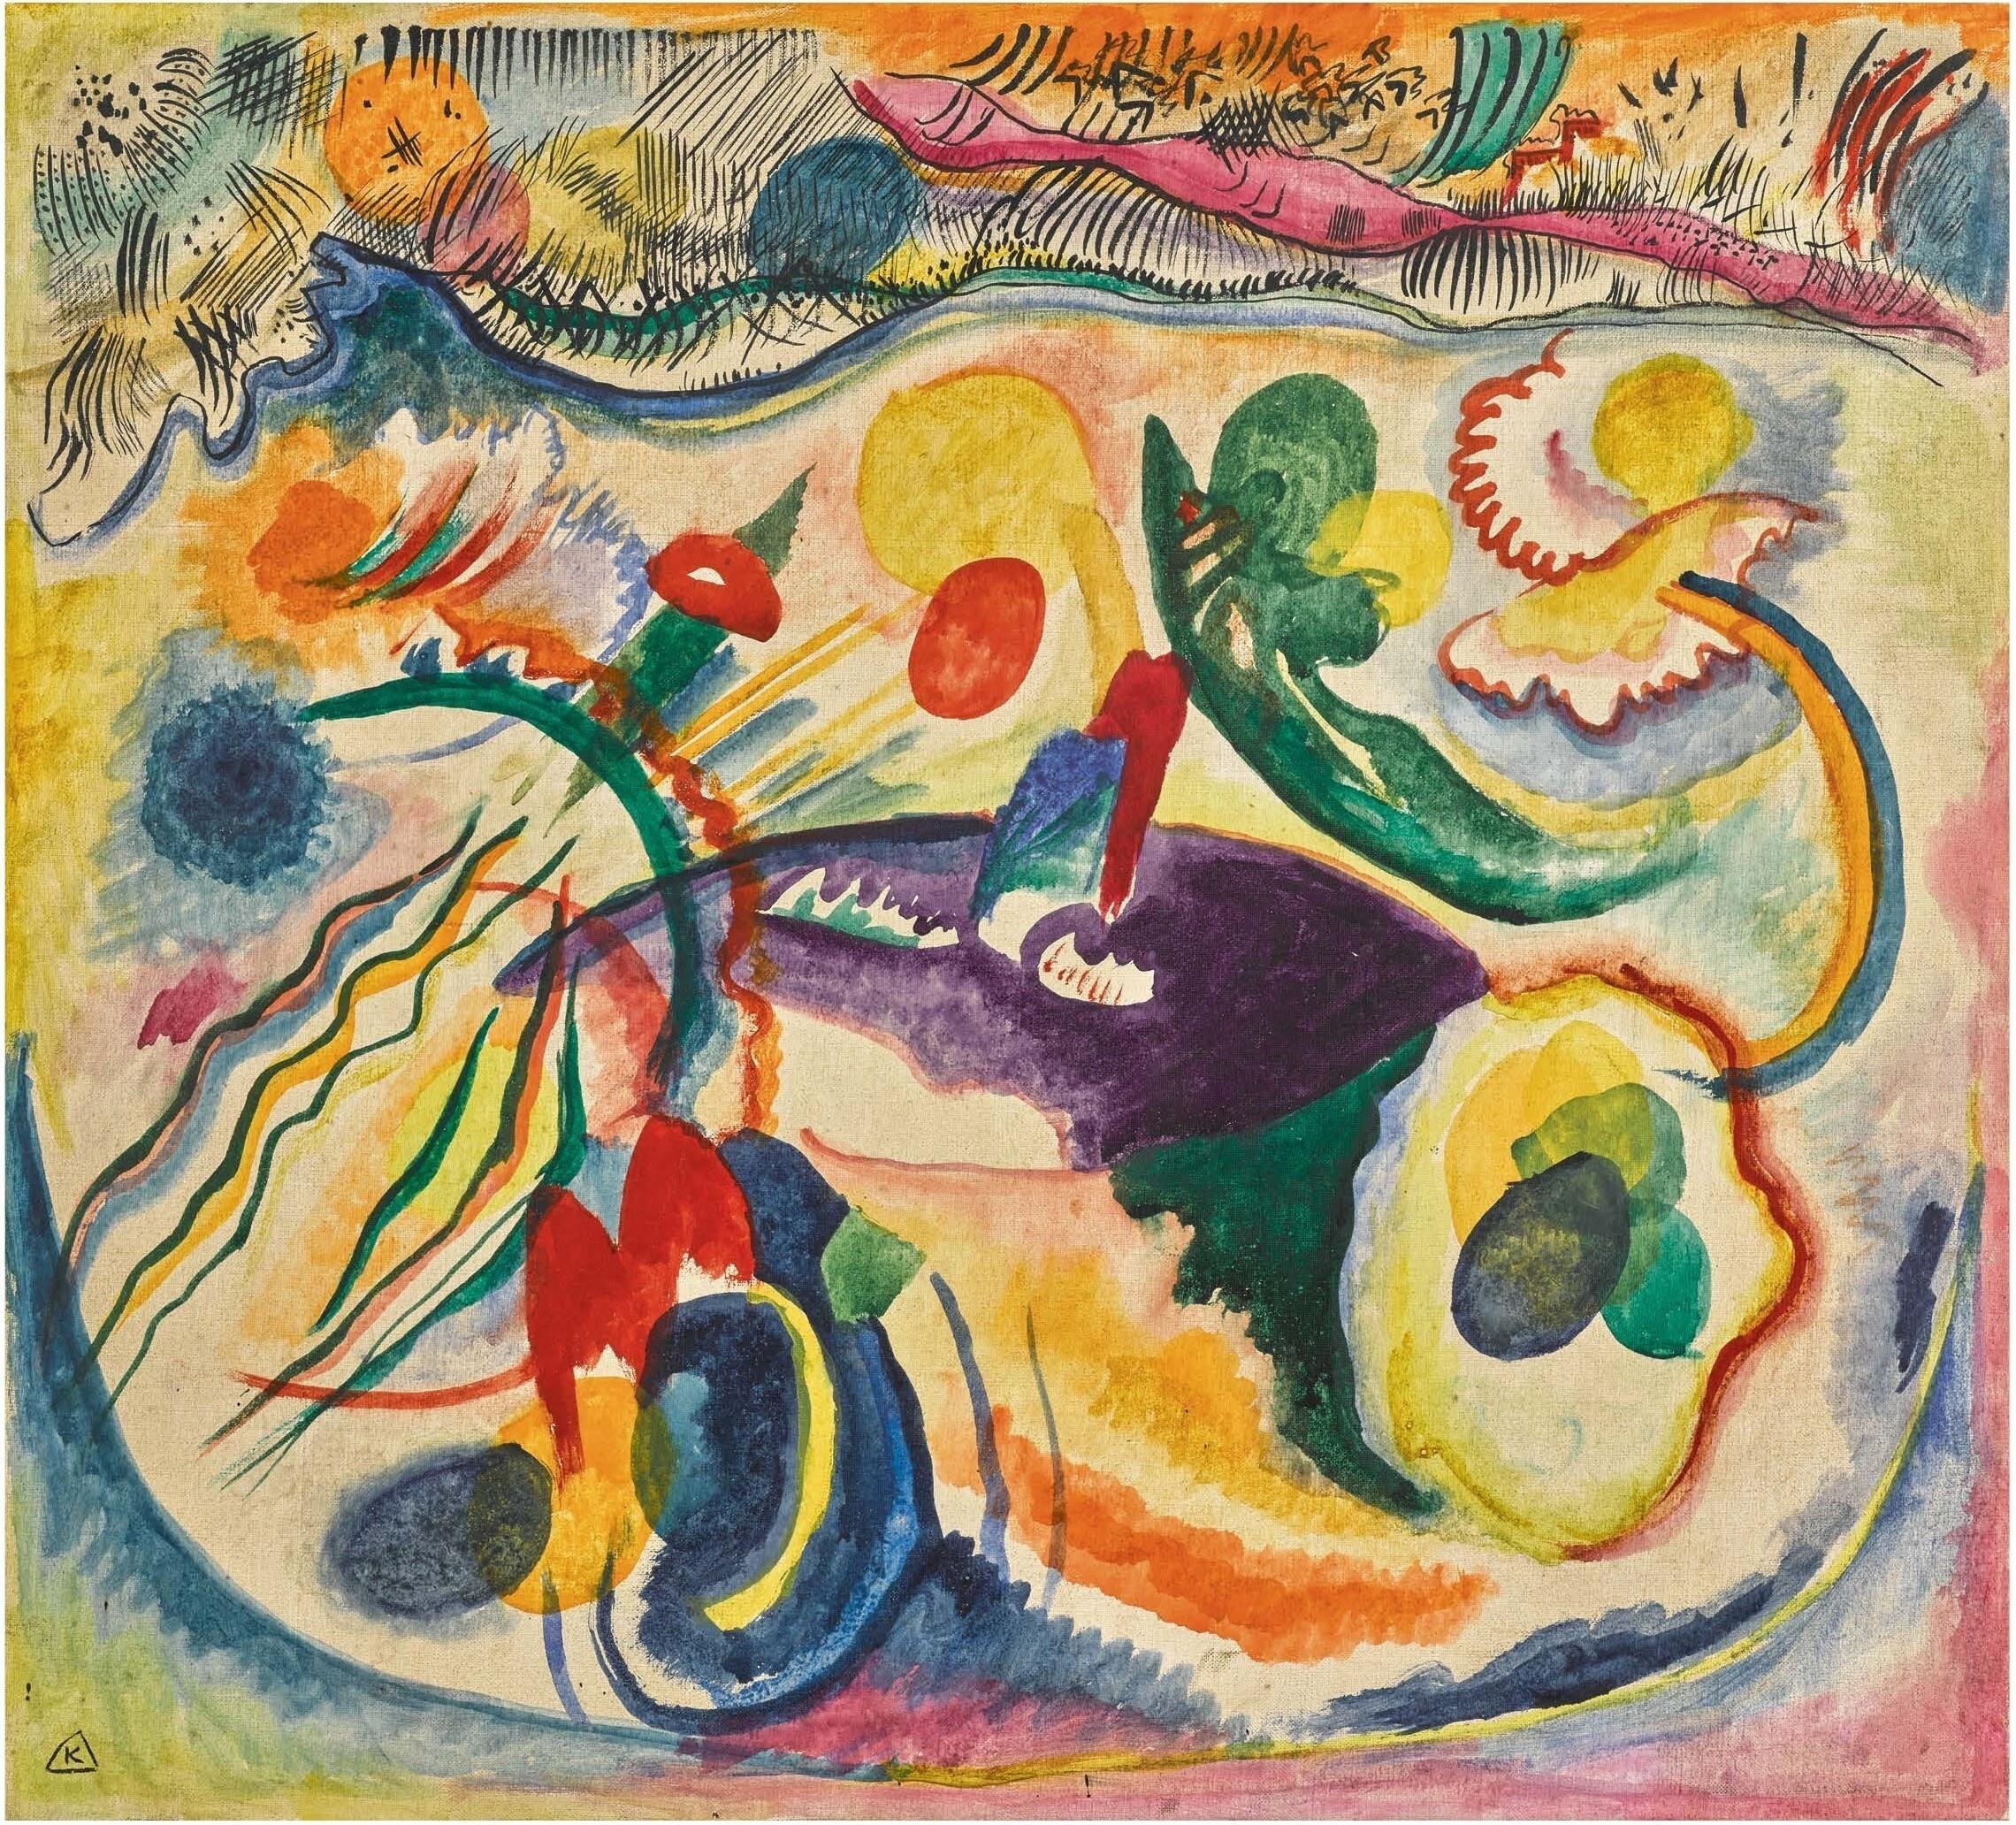 Wassily Kandinsky (1866-1944) Zum thema jüngstes gericht (1913)